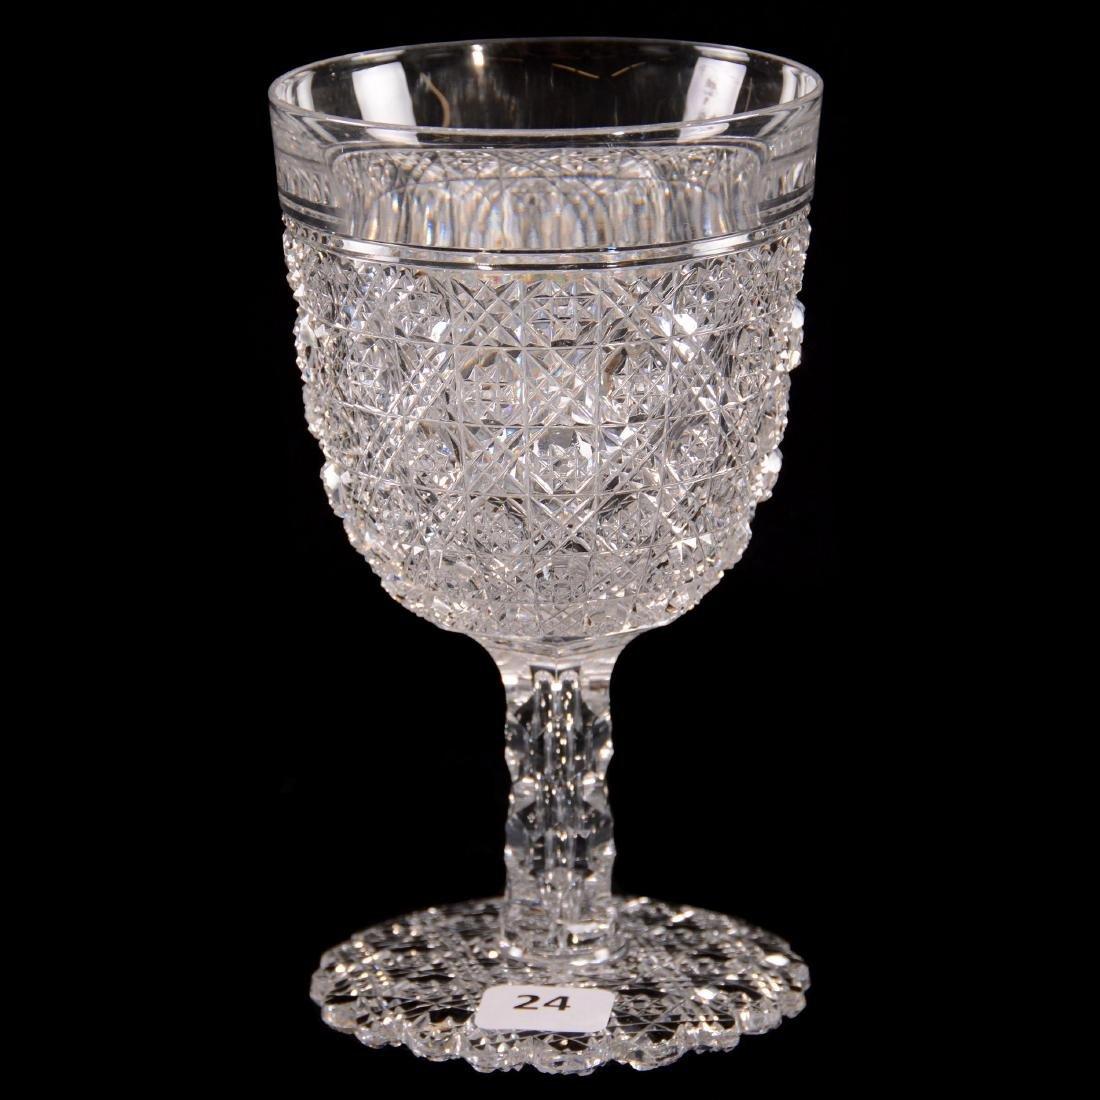 Water Goblet - BPCG